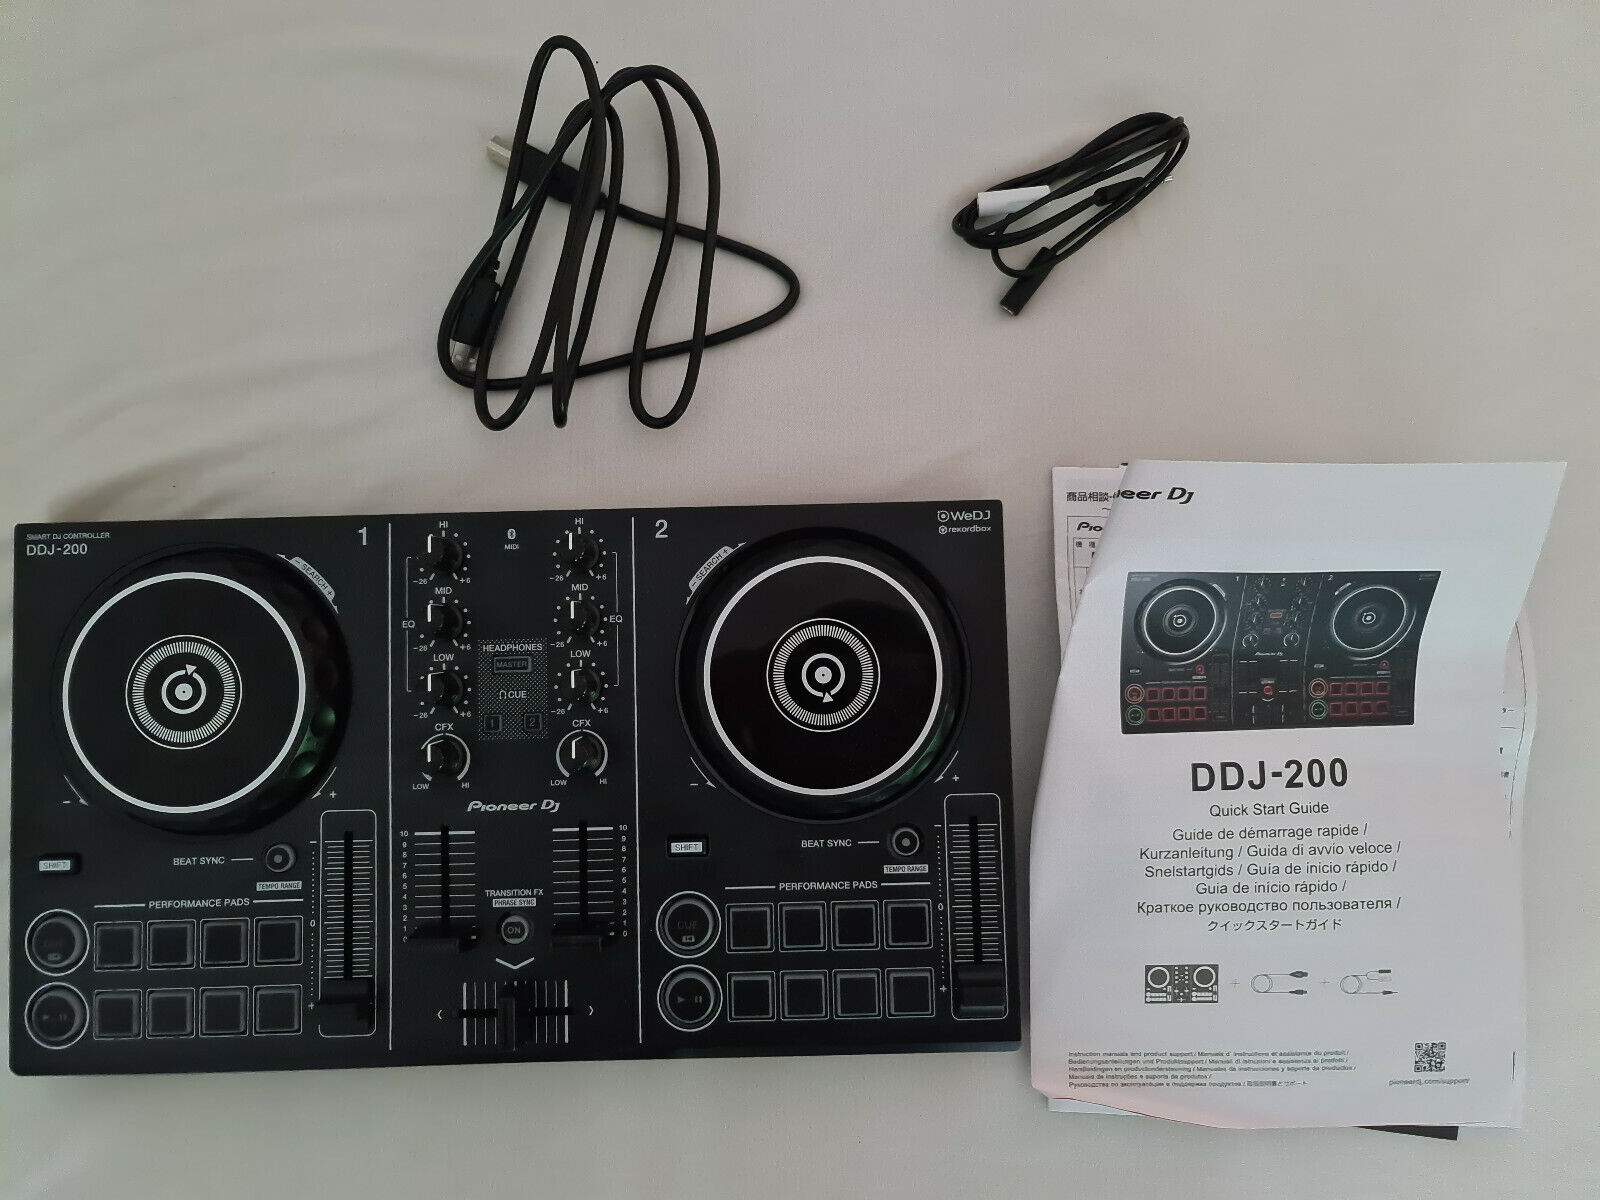 Pioneer DDJ-200 - Smart DJ-Controller